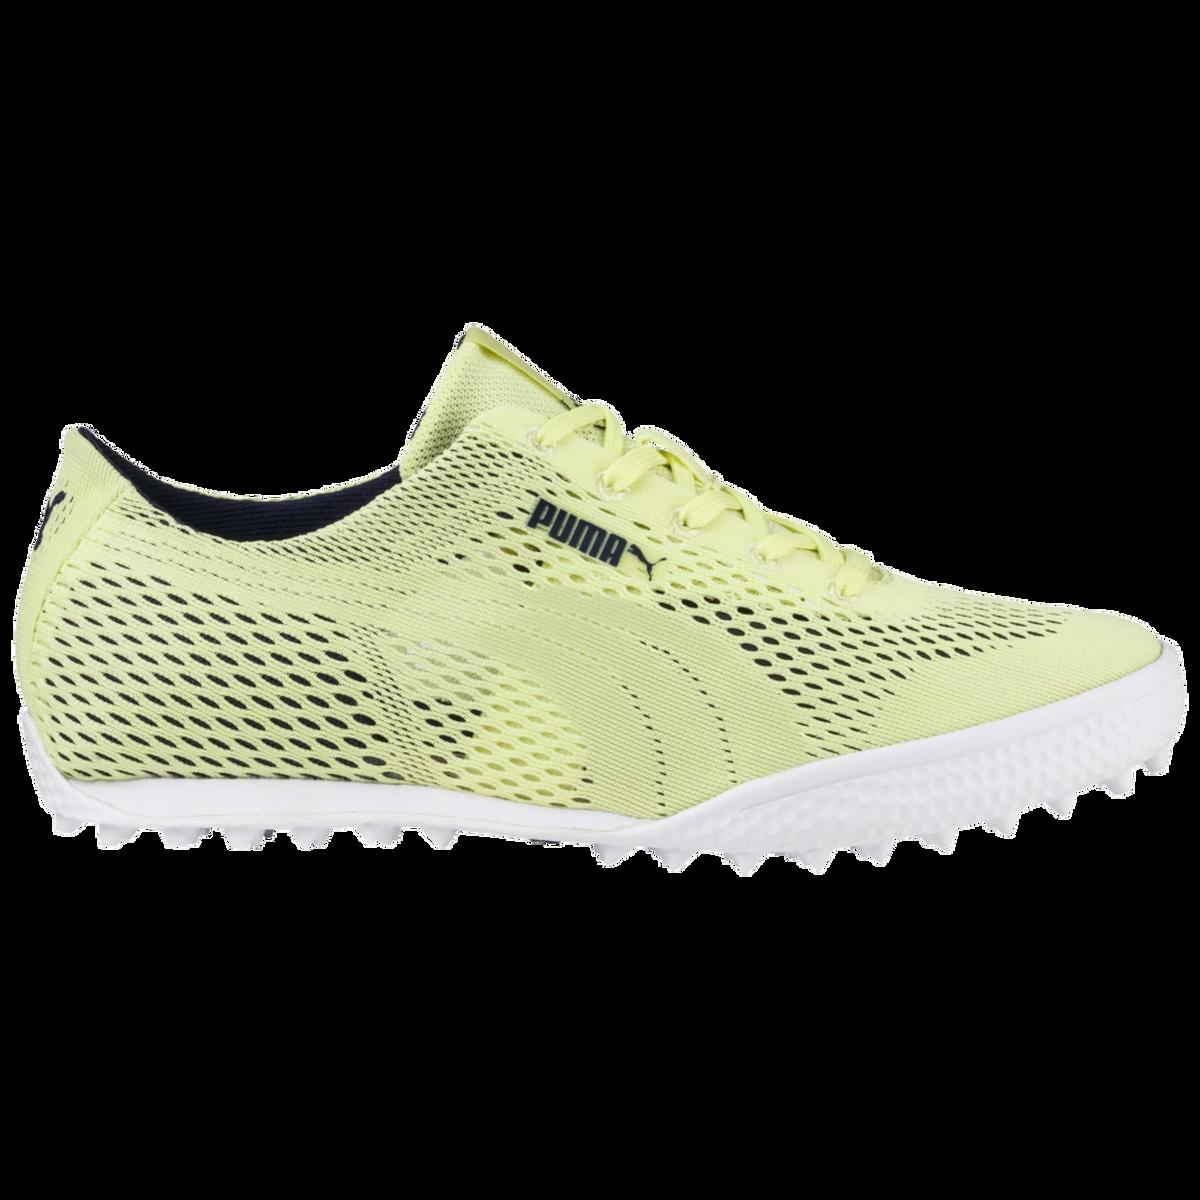 7febe8755948 PUMA Monolite Cat Woven Women s Golf Shoe - Lime